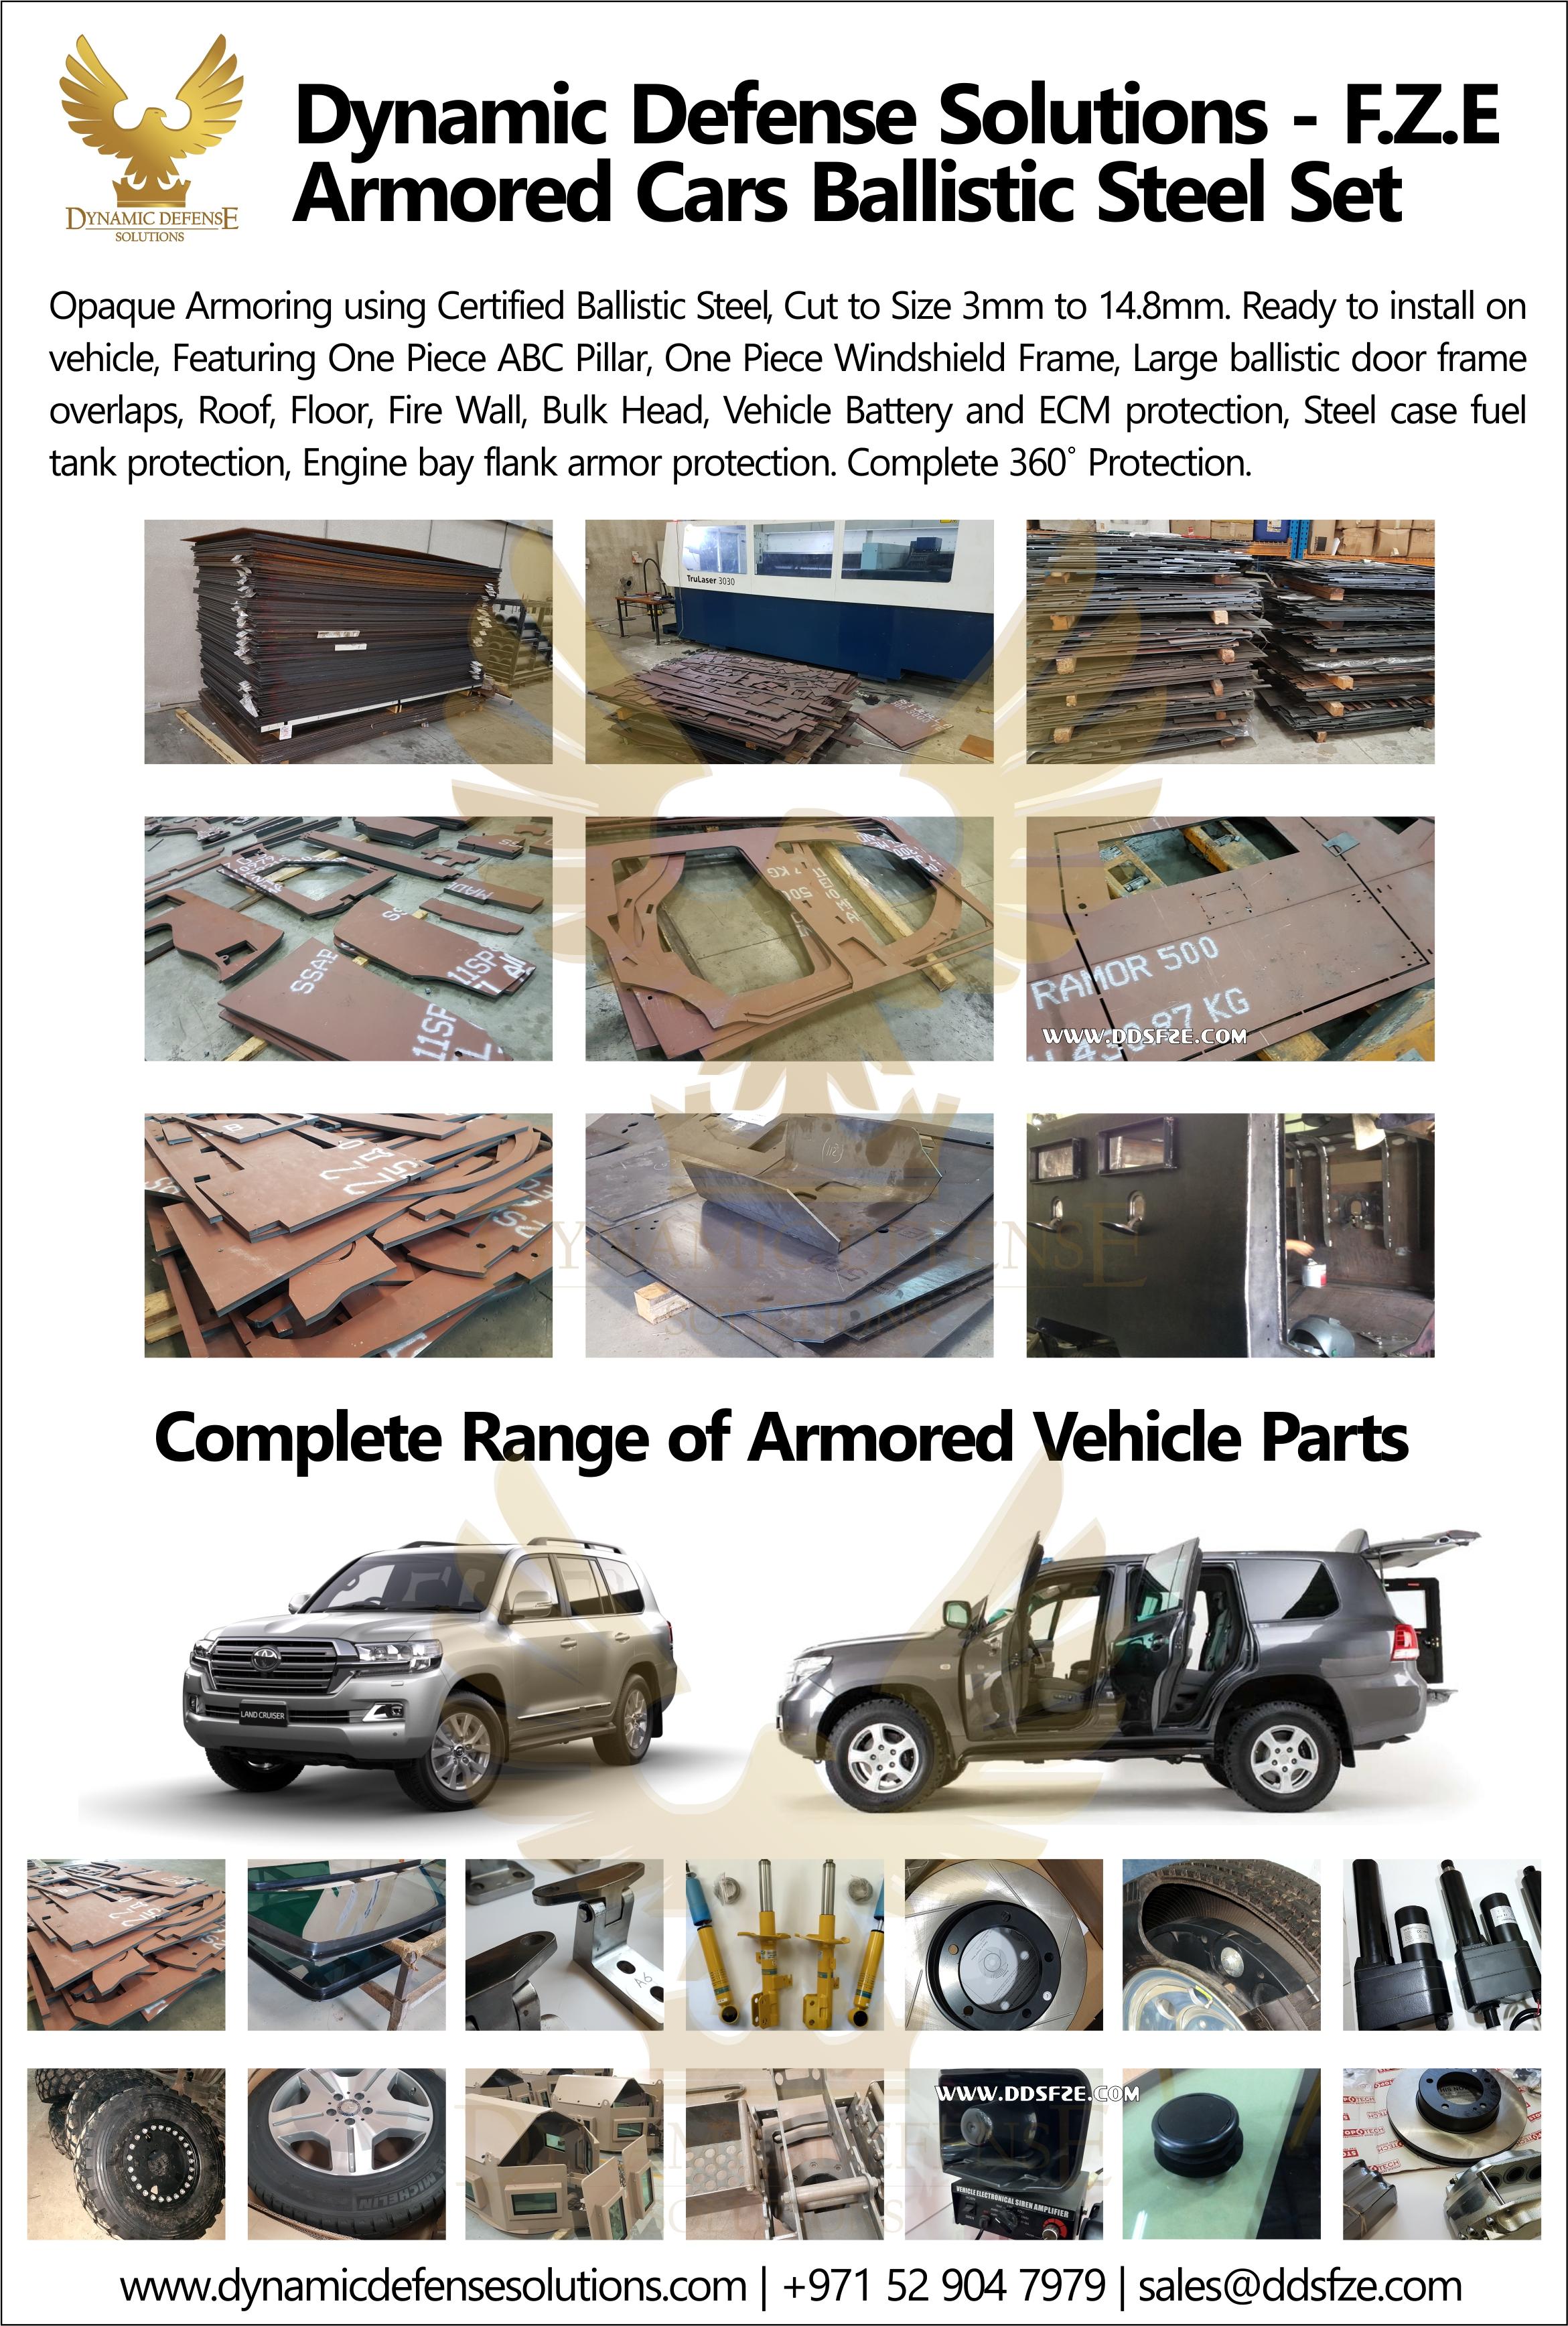 Armored Cars Toyota Land Cruiser 200 Ballistic Steel Parts